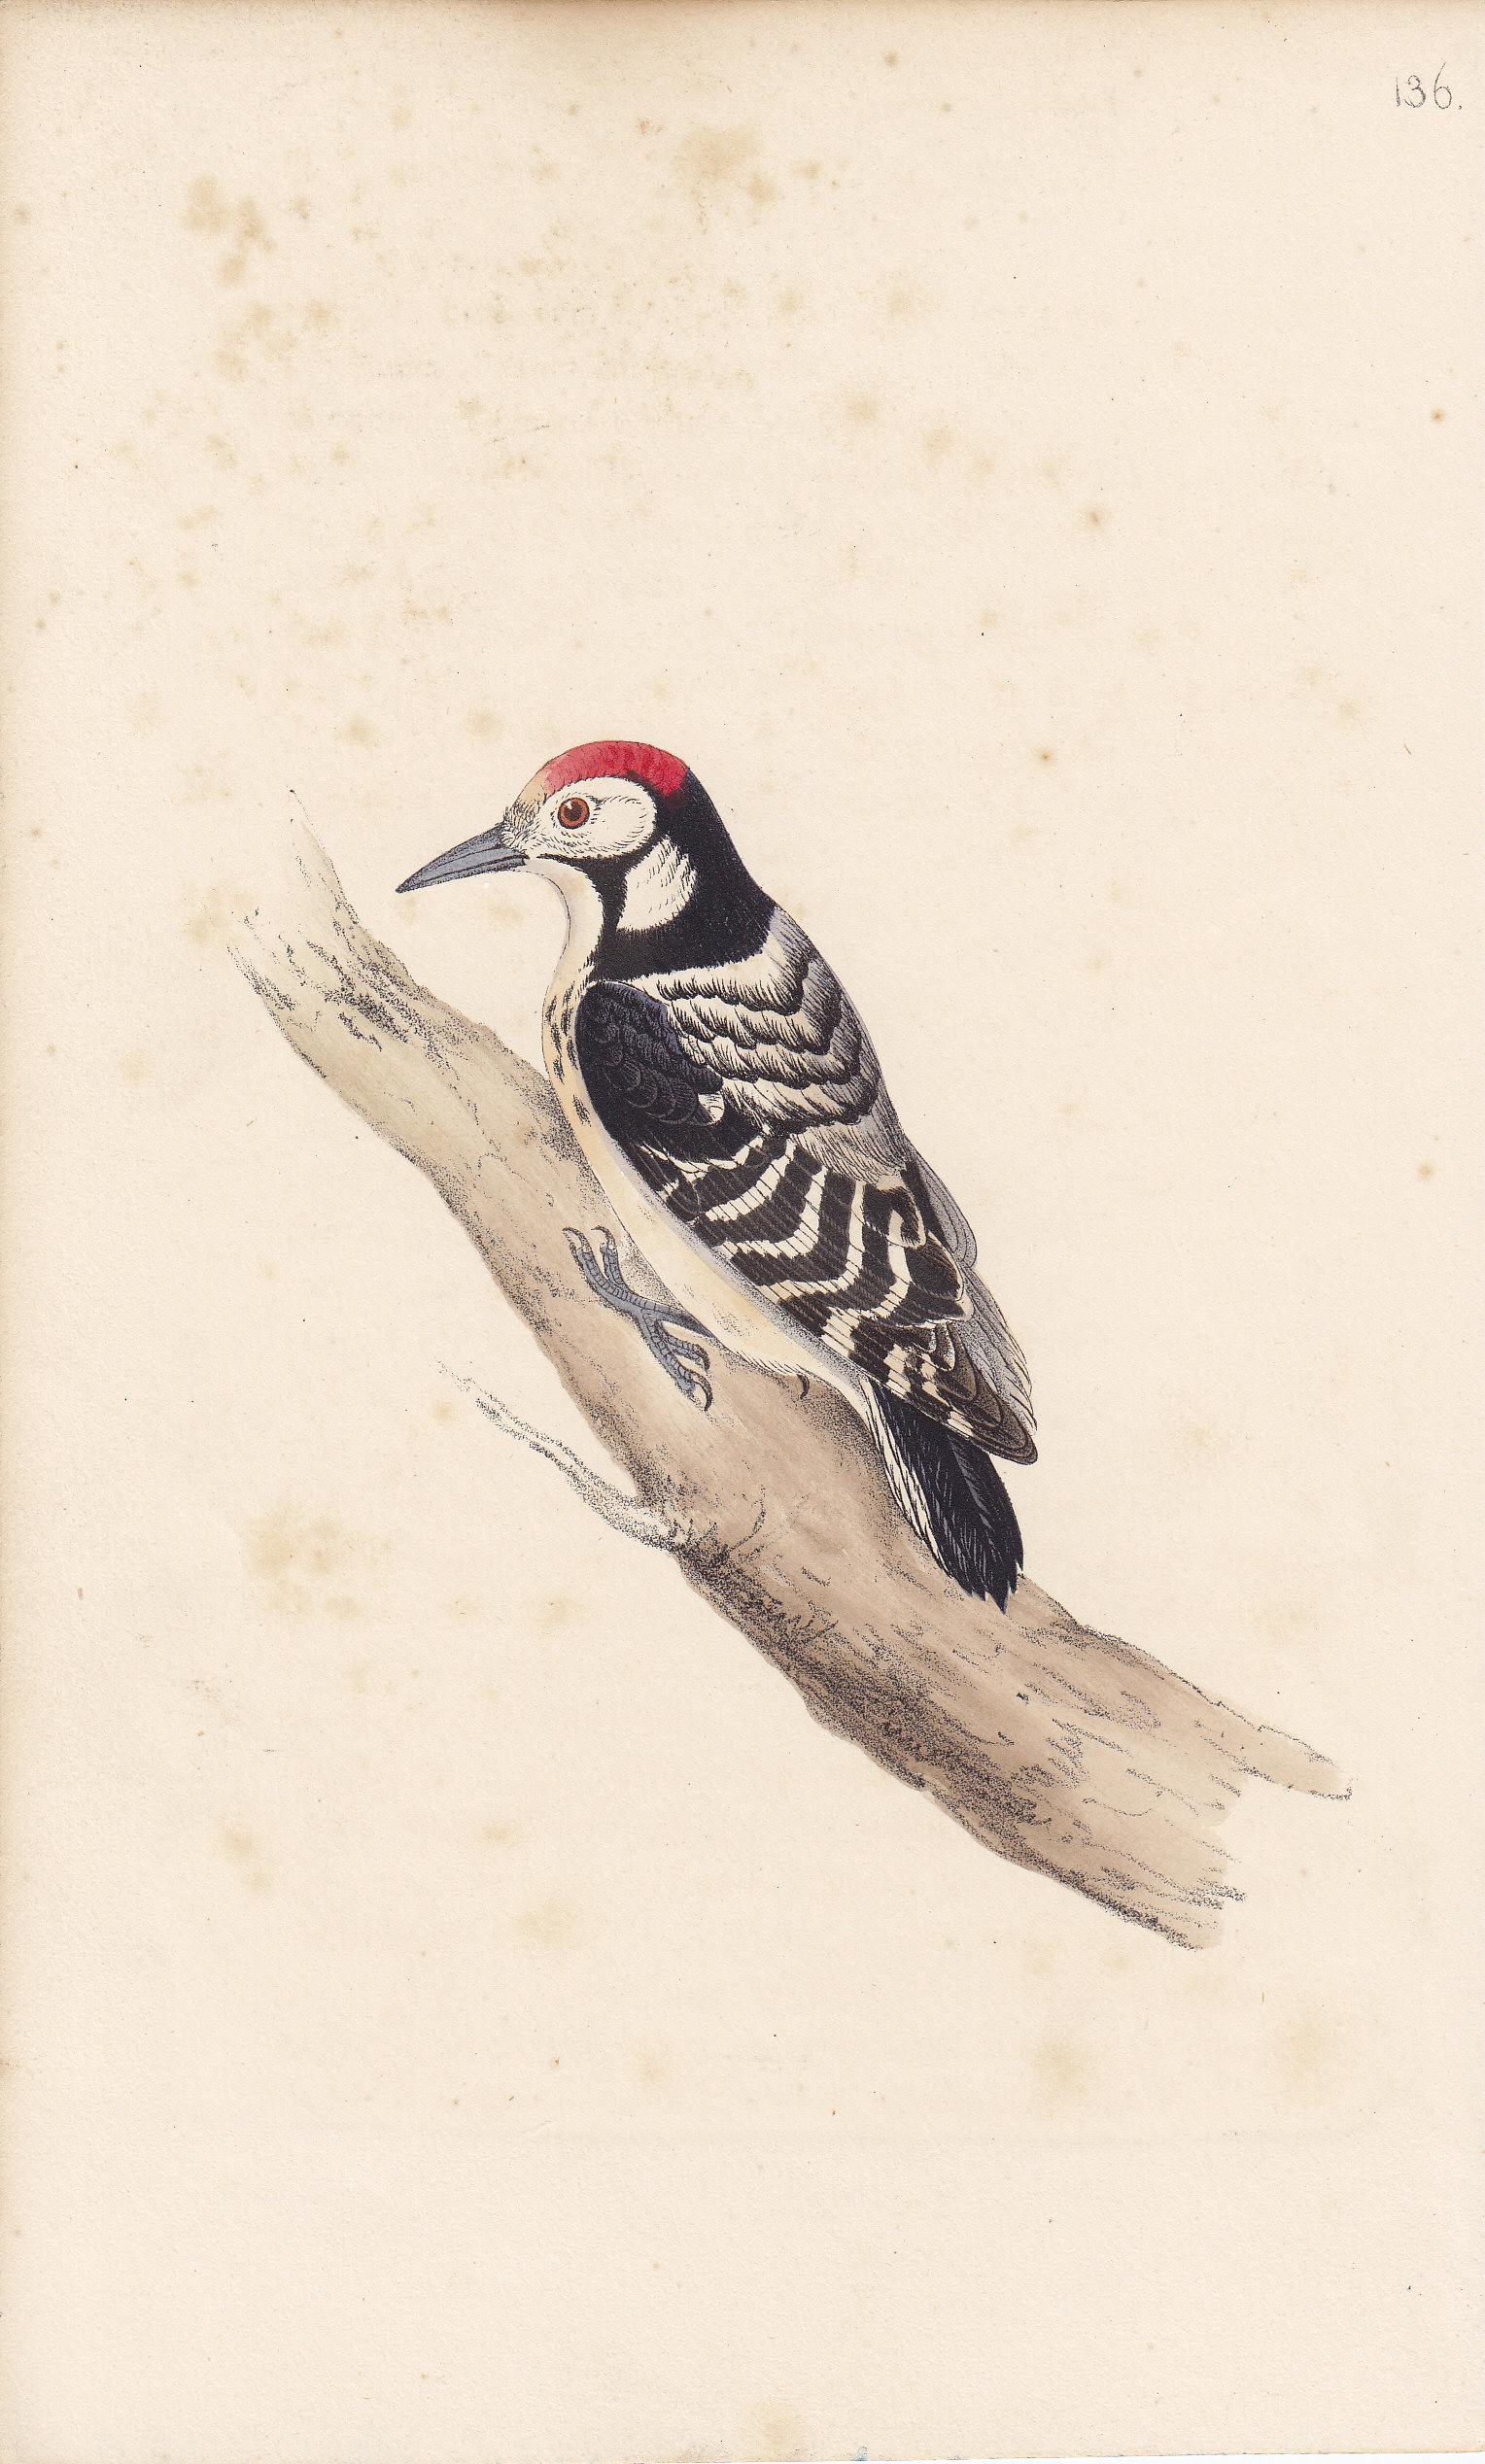 Barred Woodpecker